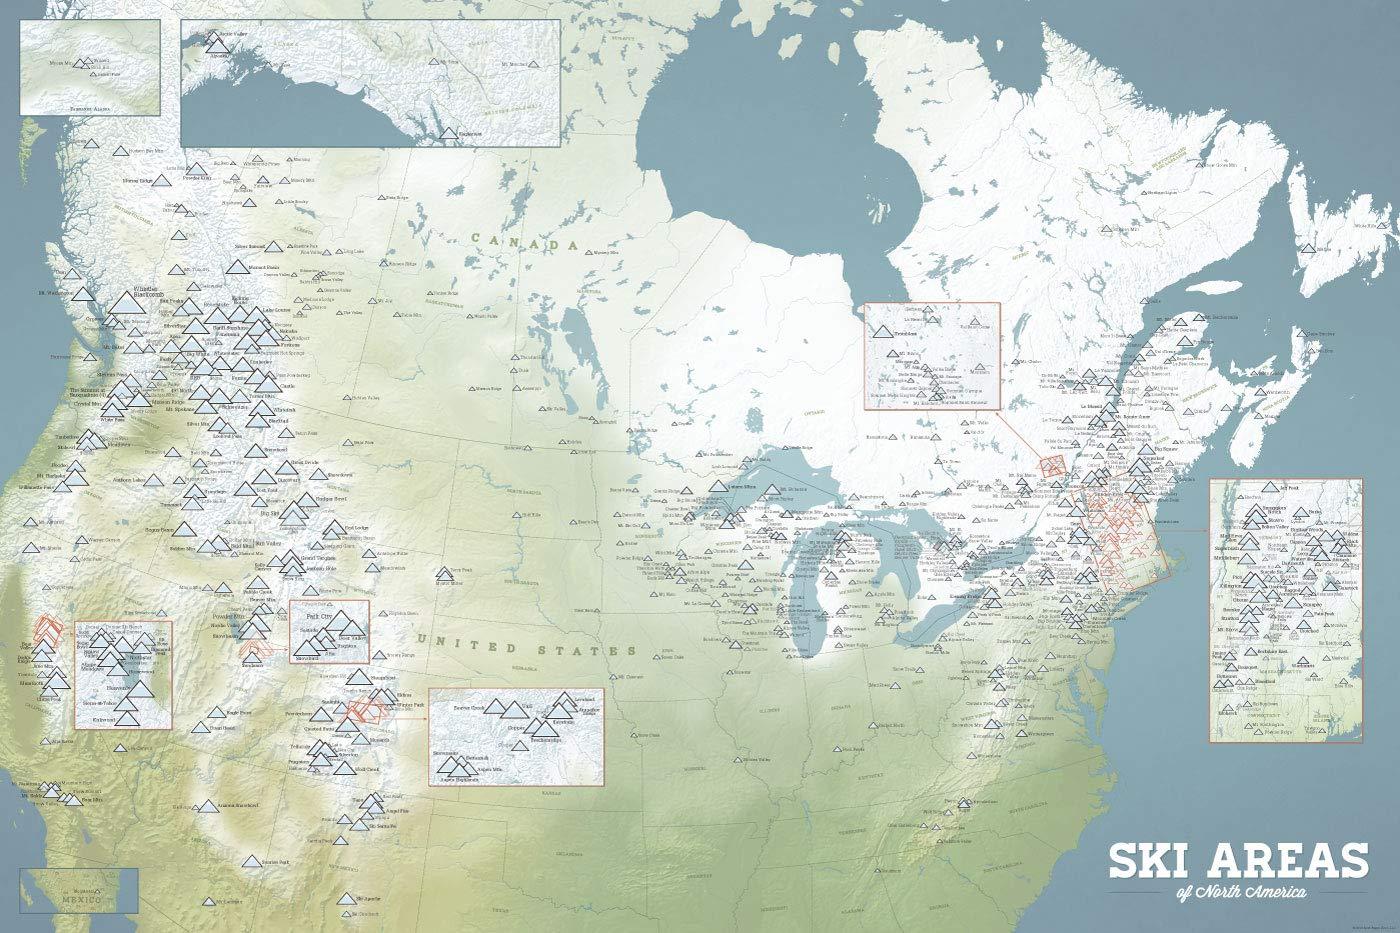 Amazon.com: North America Ski Resorts Map 24x36 Poster (Natural Earth):  Home & Kitchen